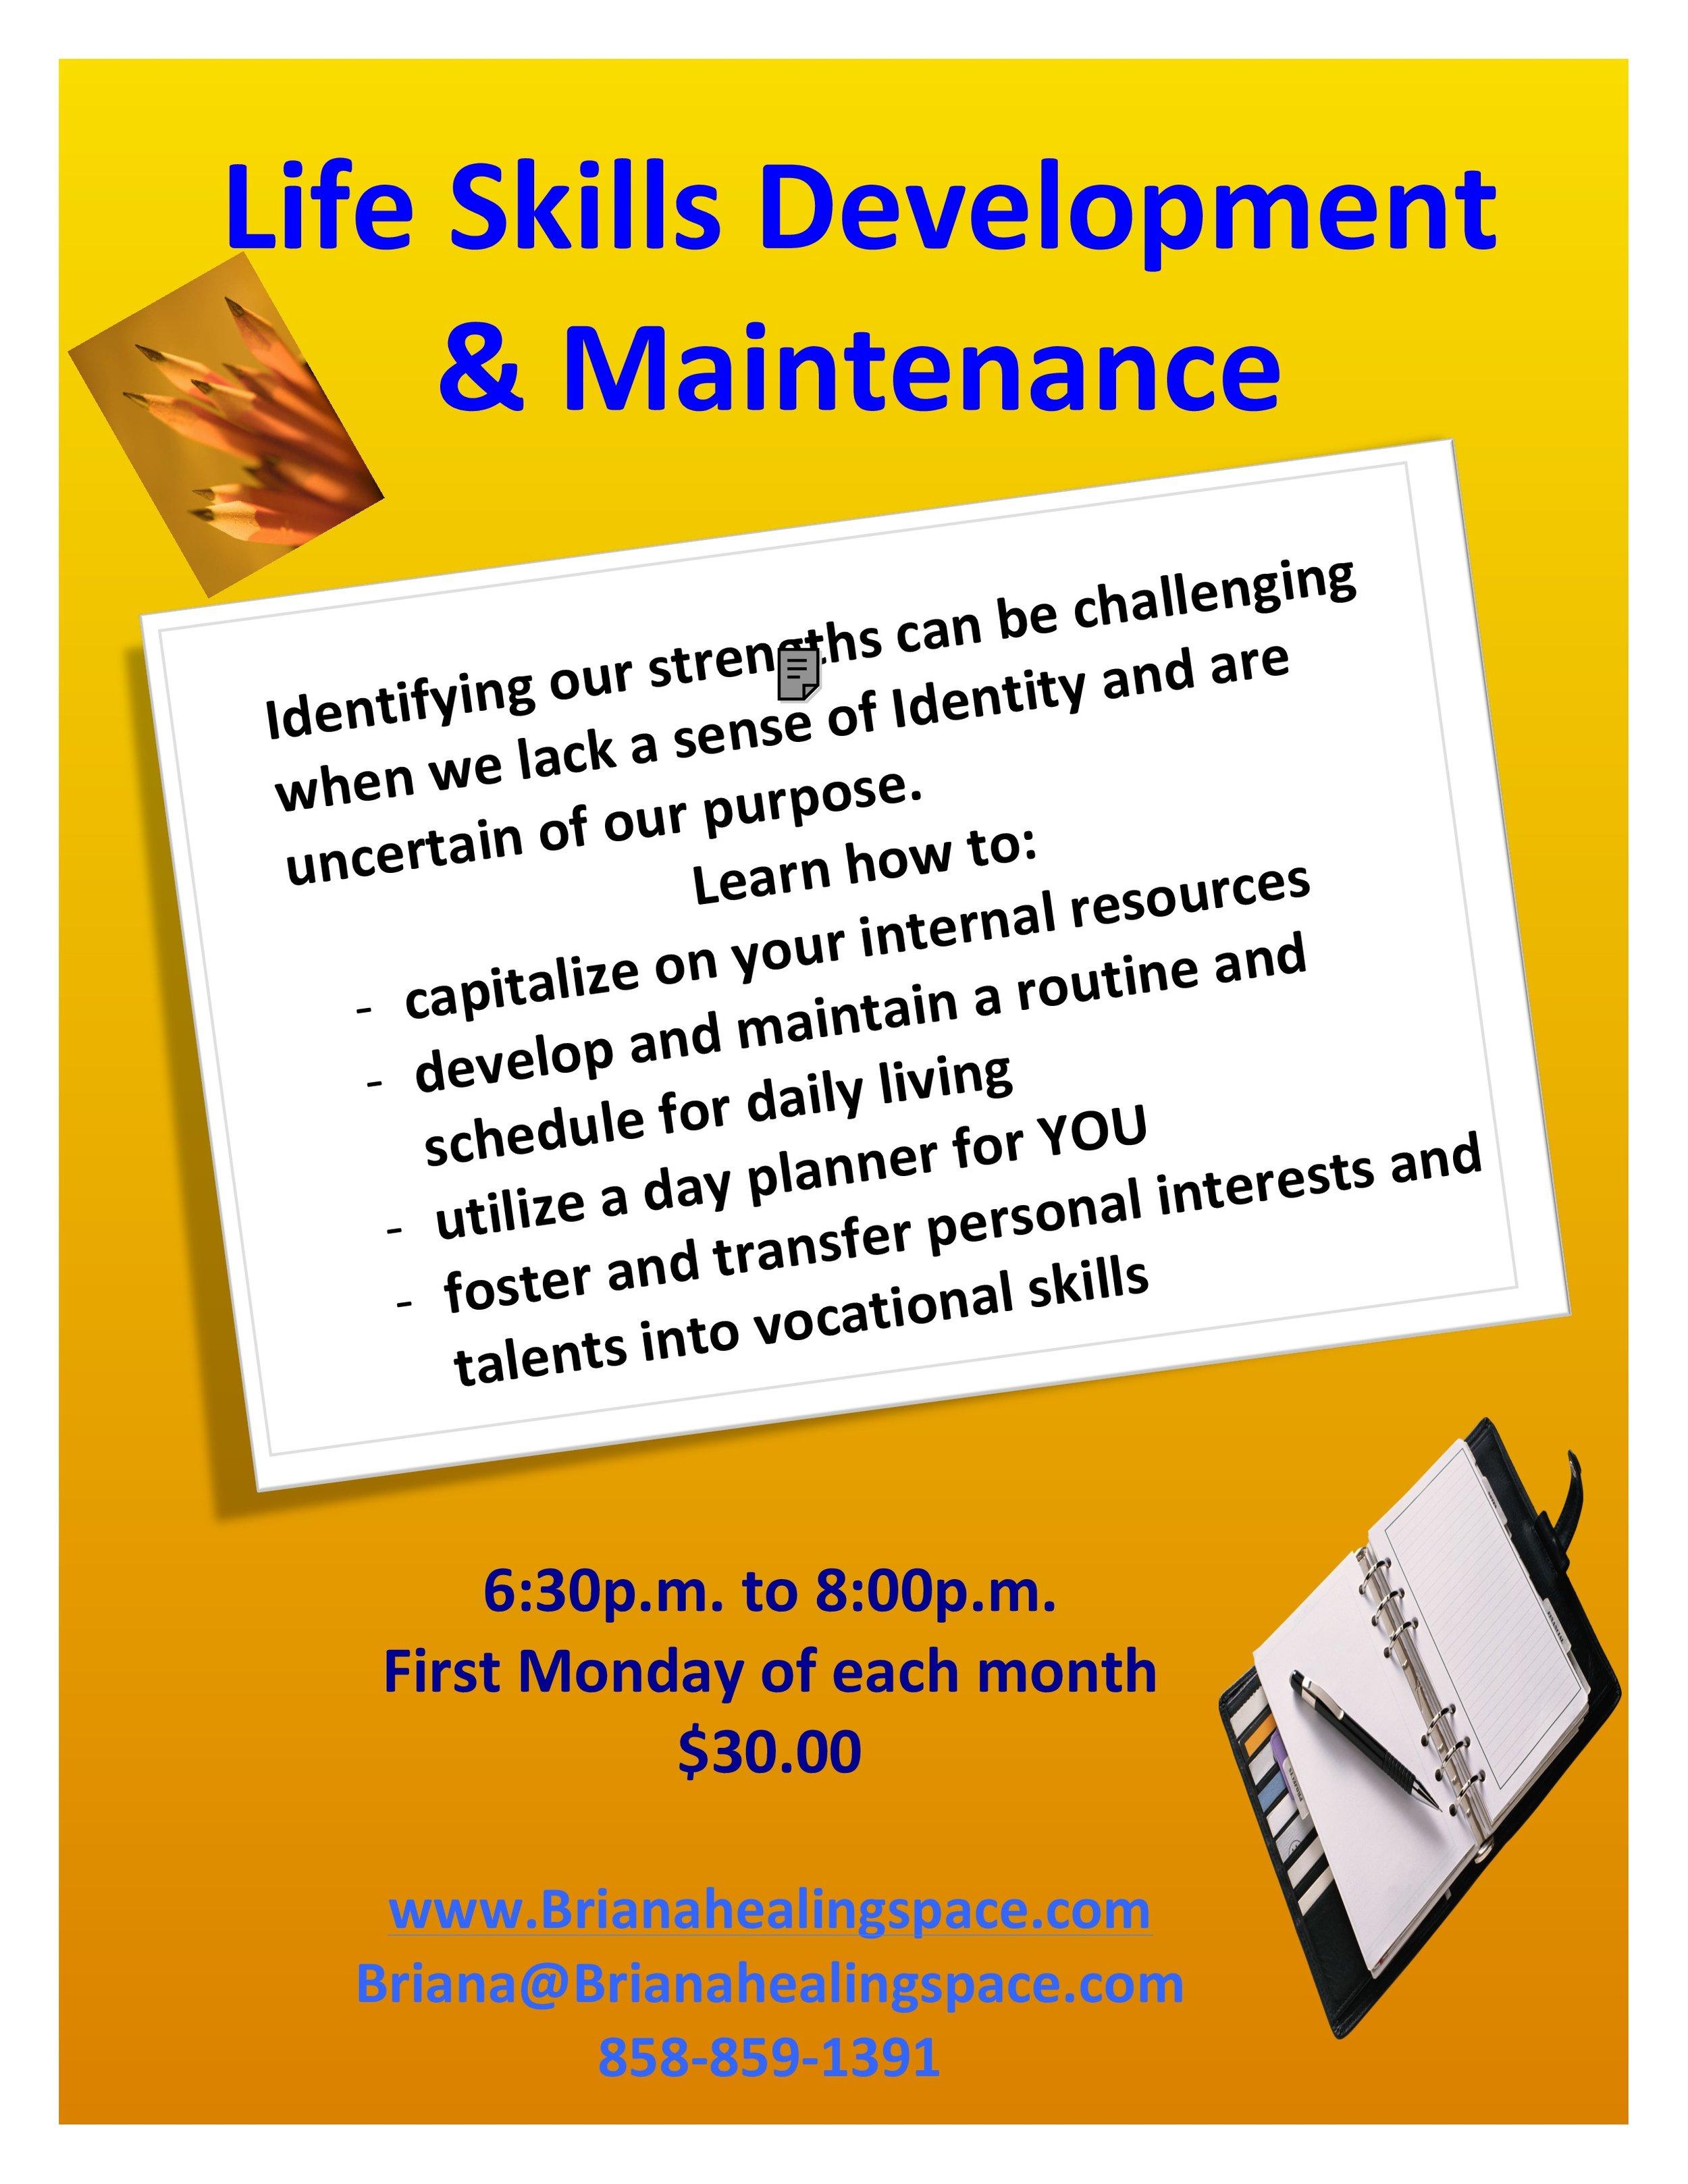 Life Skills Development and Maintenance